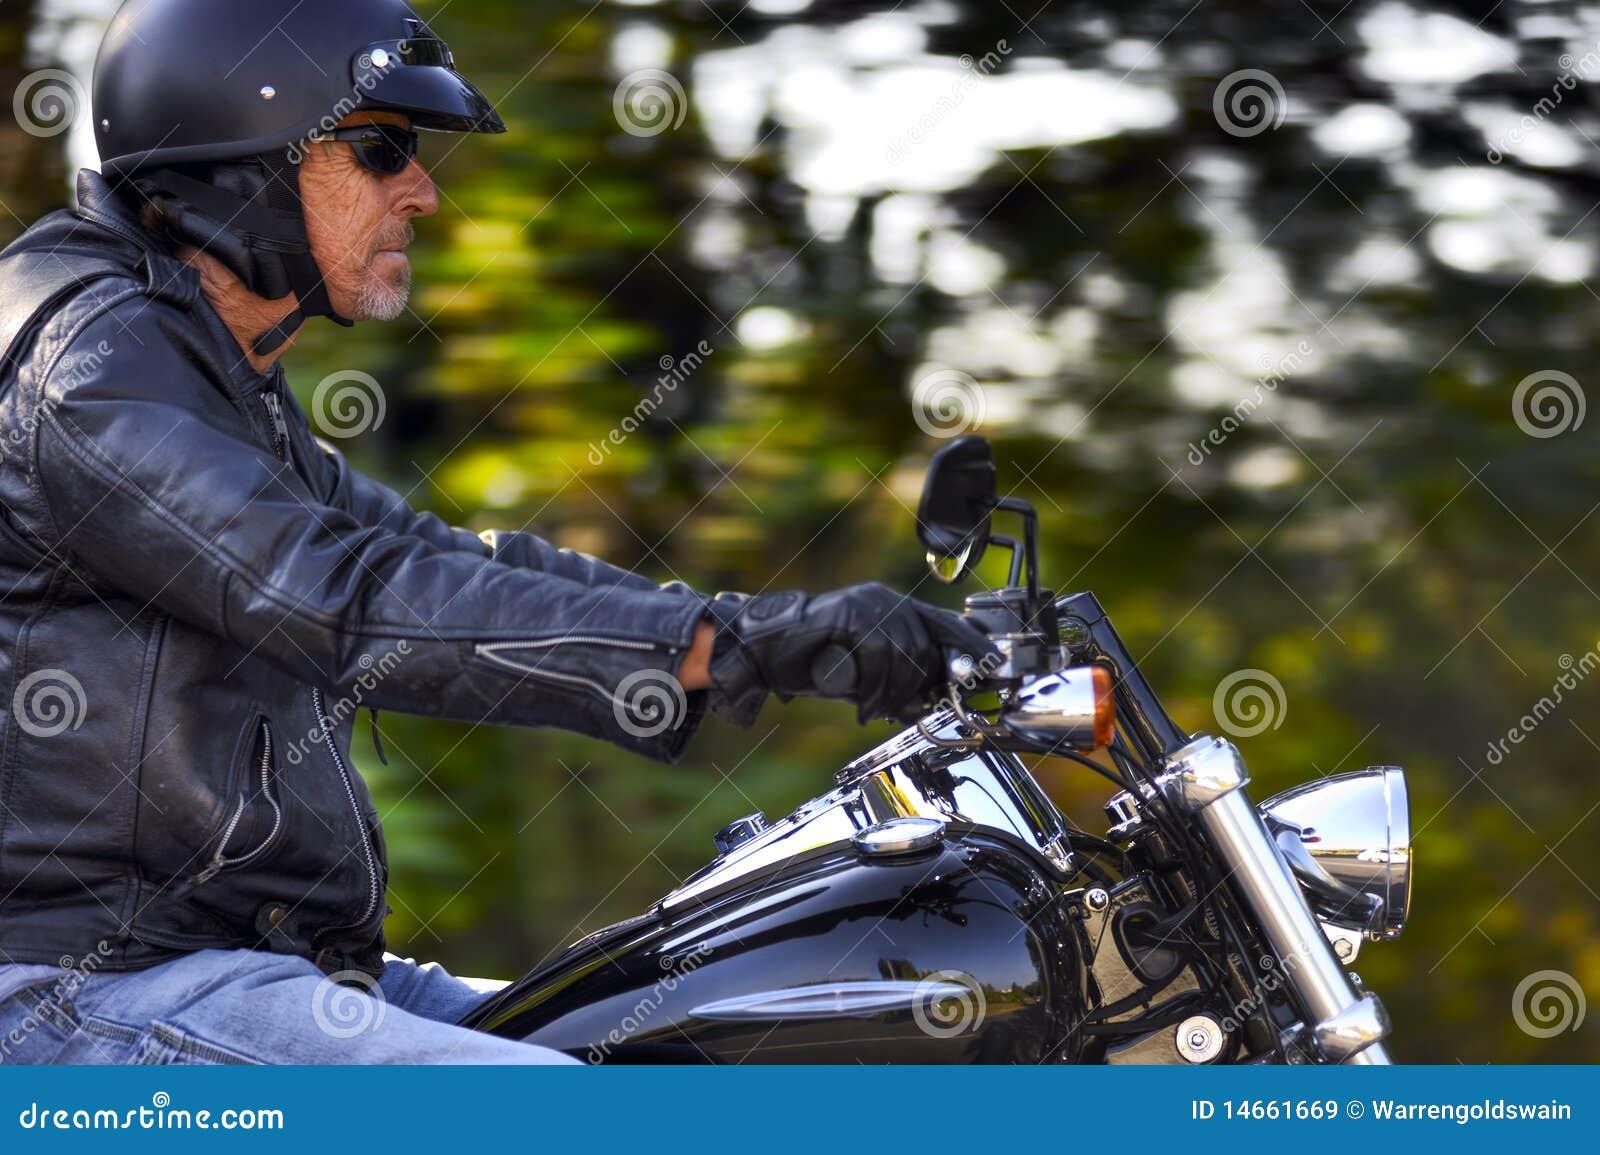 Motorbike Man Has Freedom Royalty Free Stock Images ...